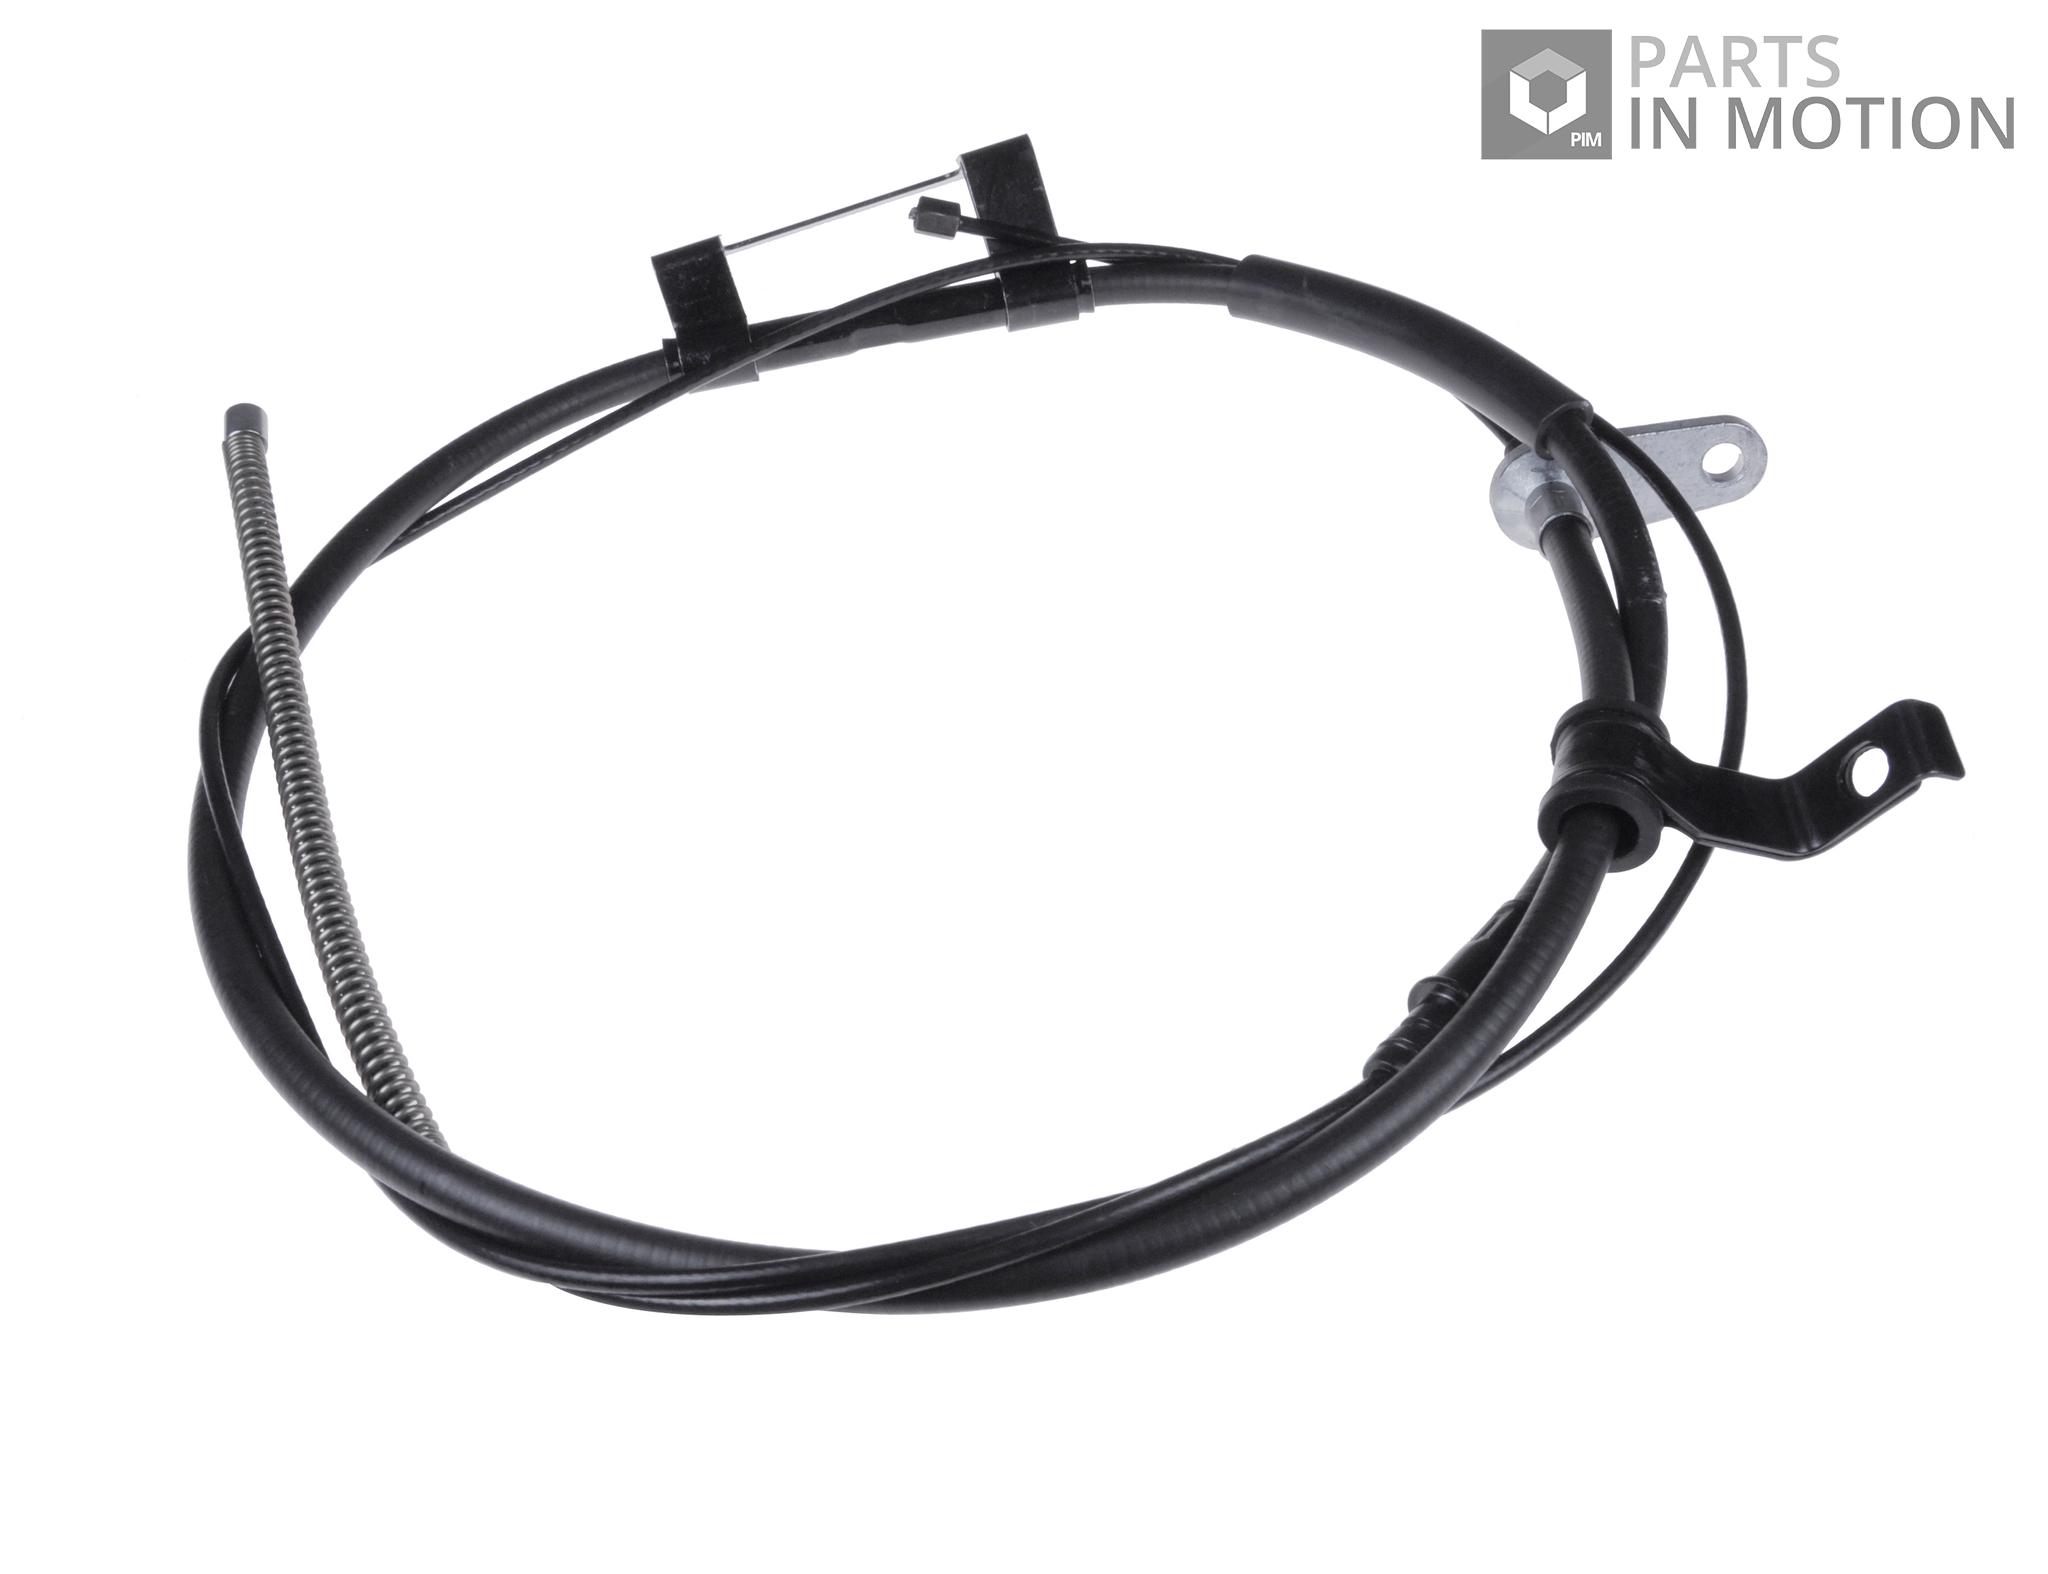 Handbrake Cable fits KIA SEDONA Mk2 2.9D Front 01 to 06 J3 Hand Brake Parking